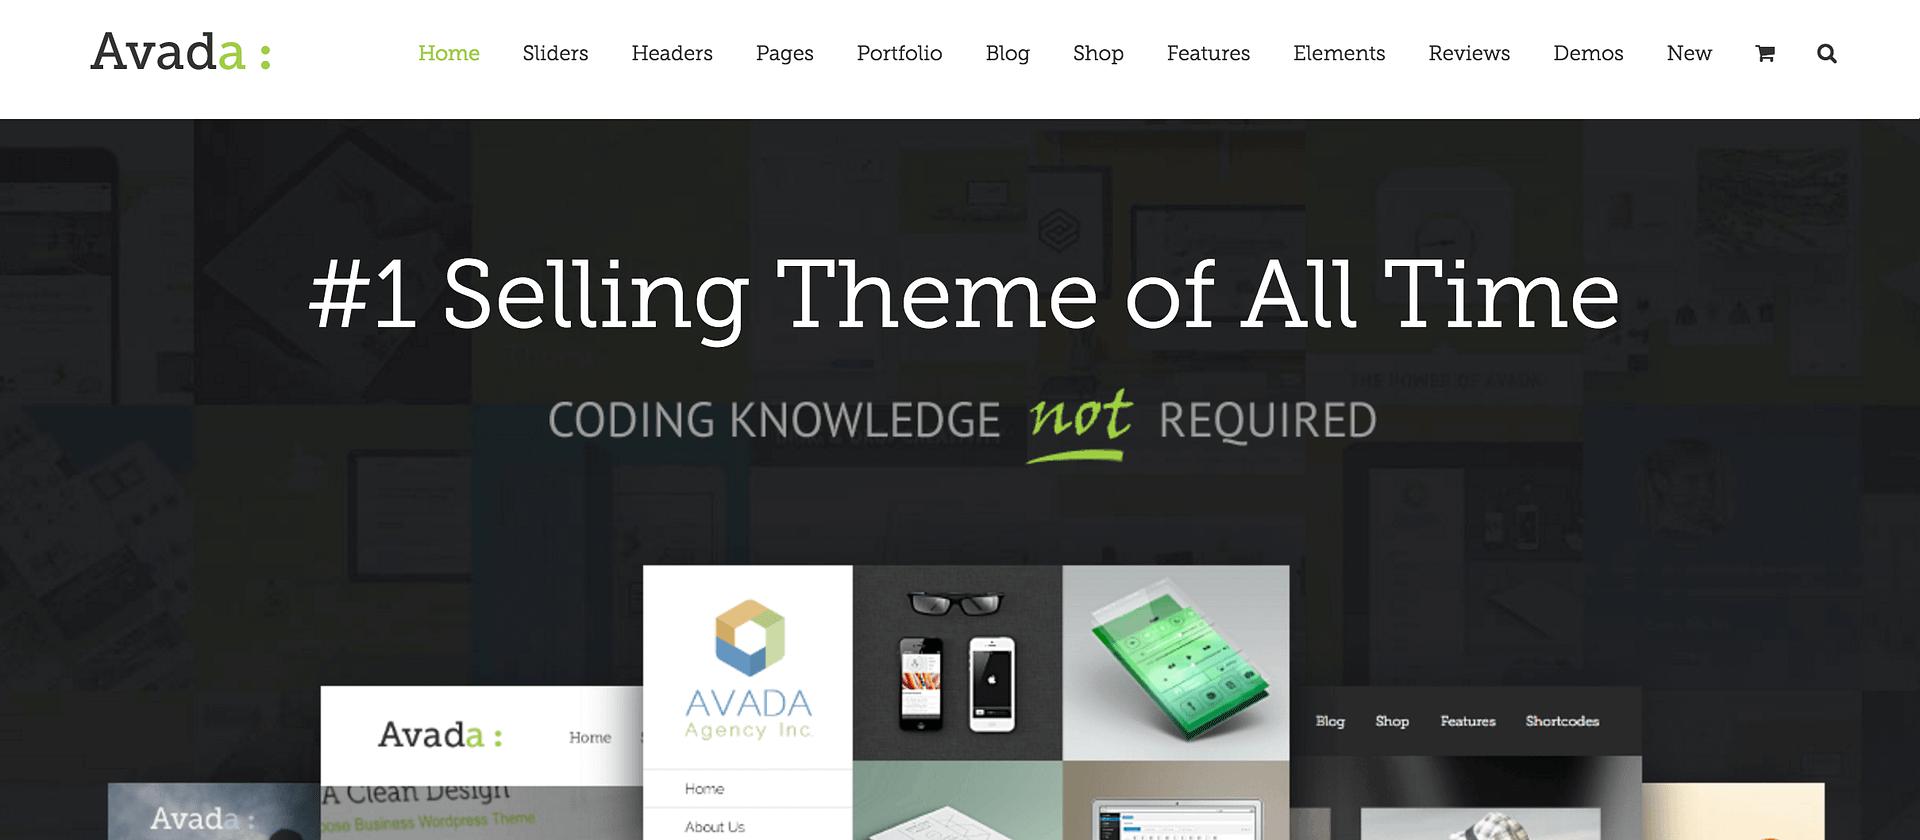 The Avada homepage.